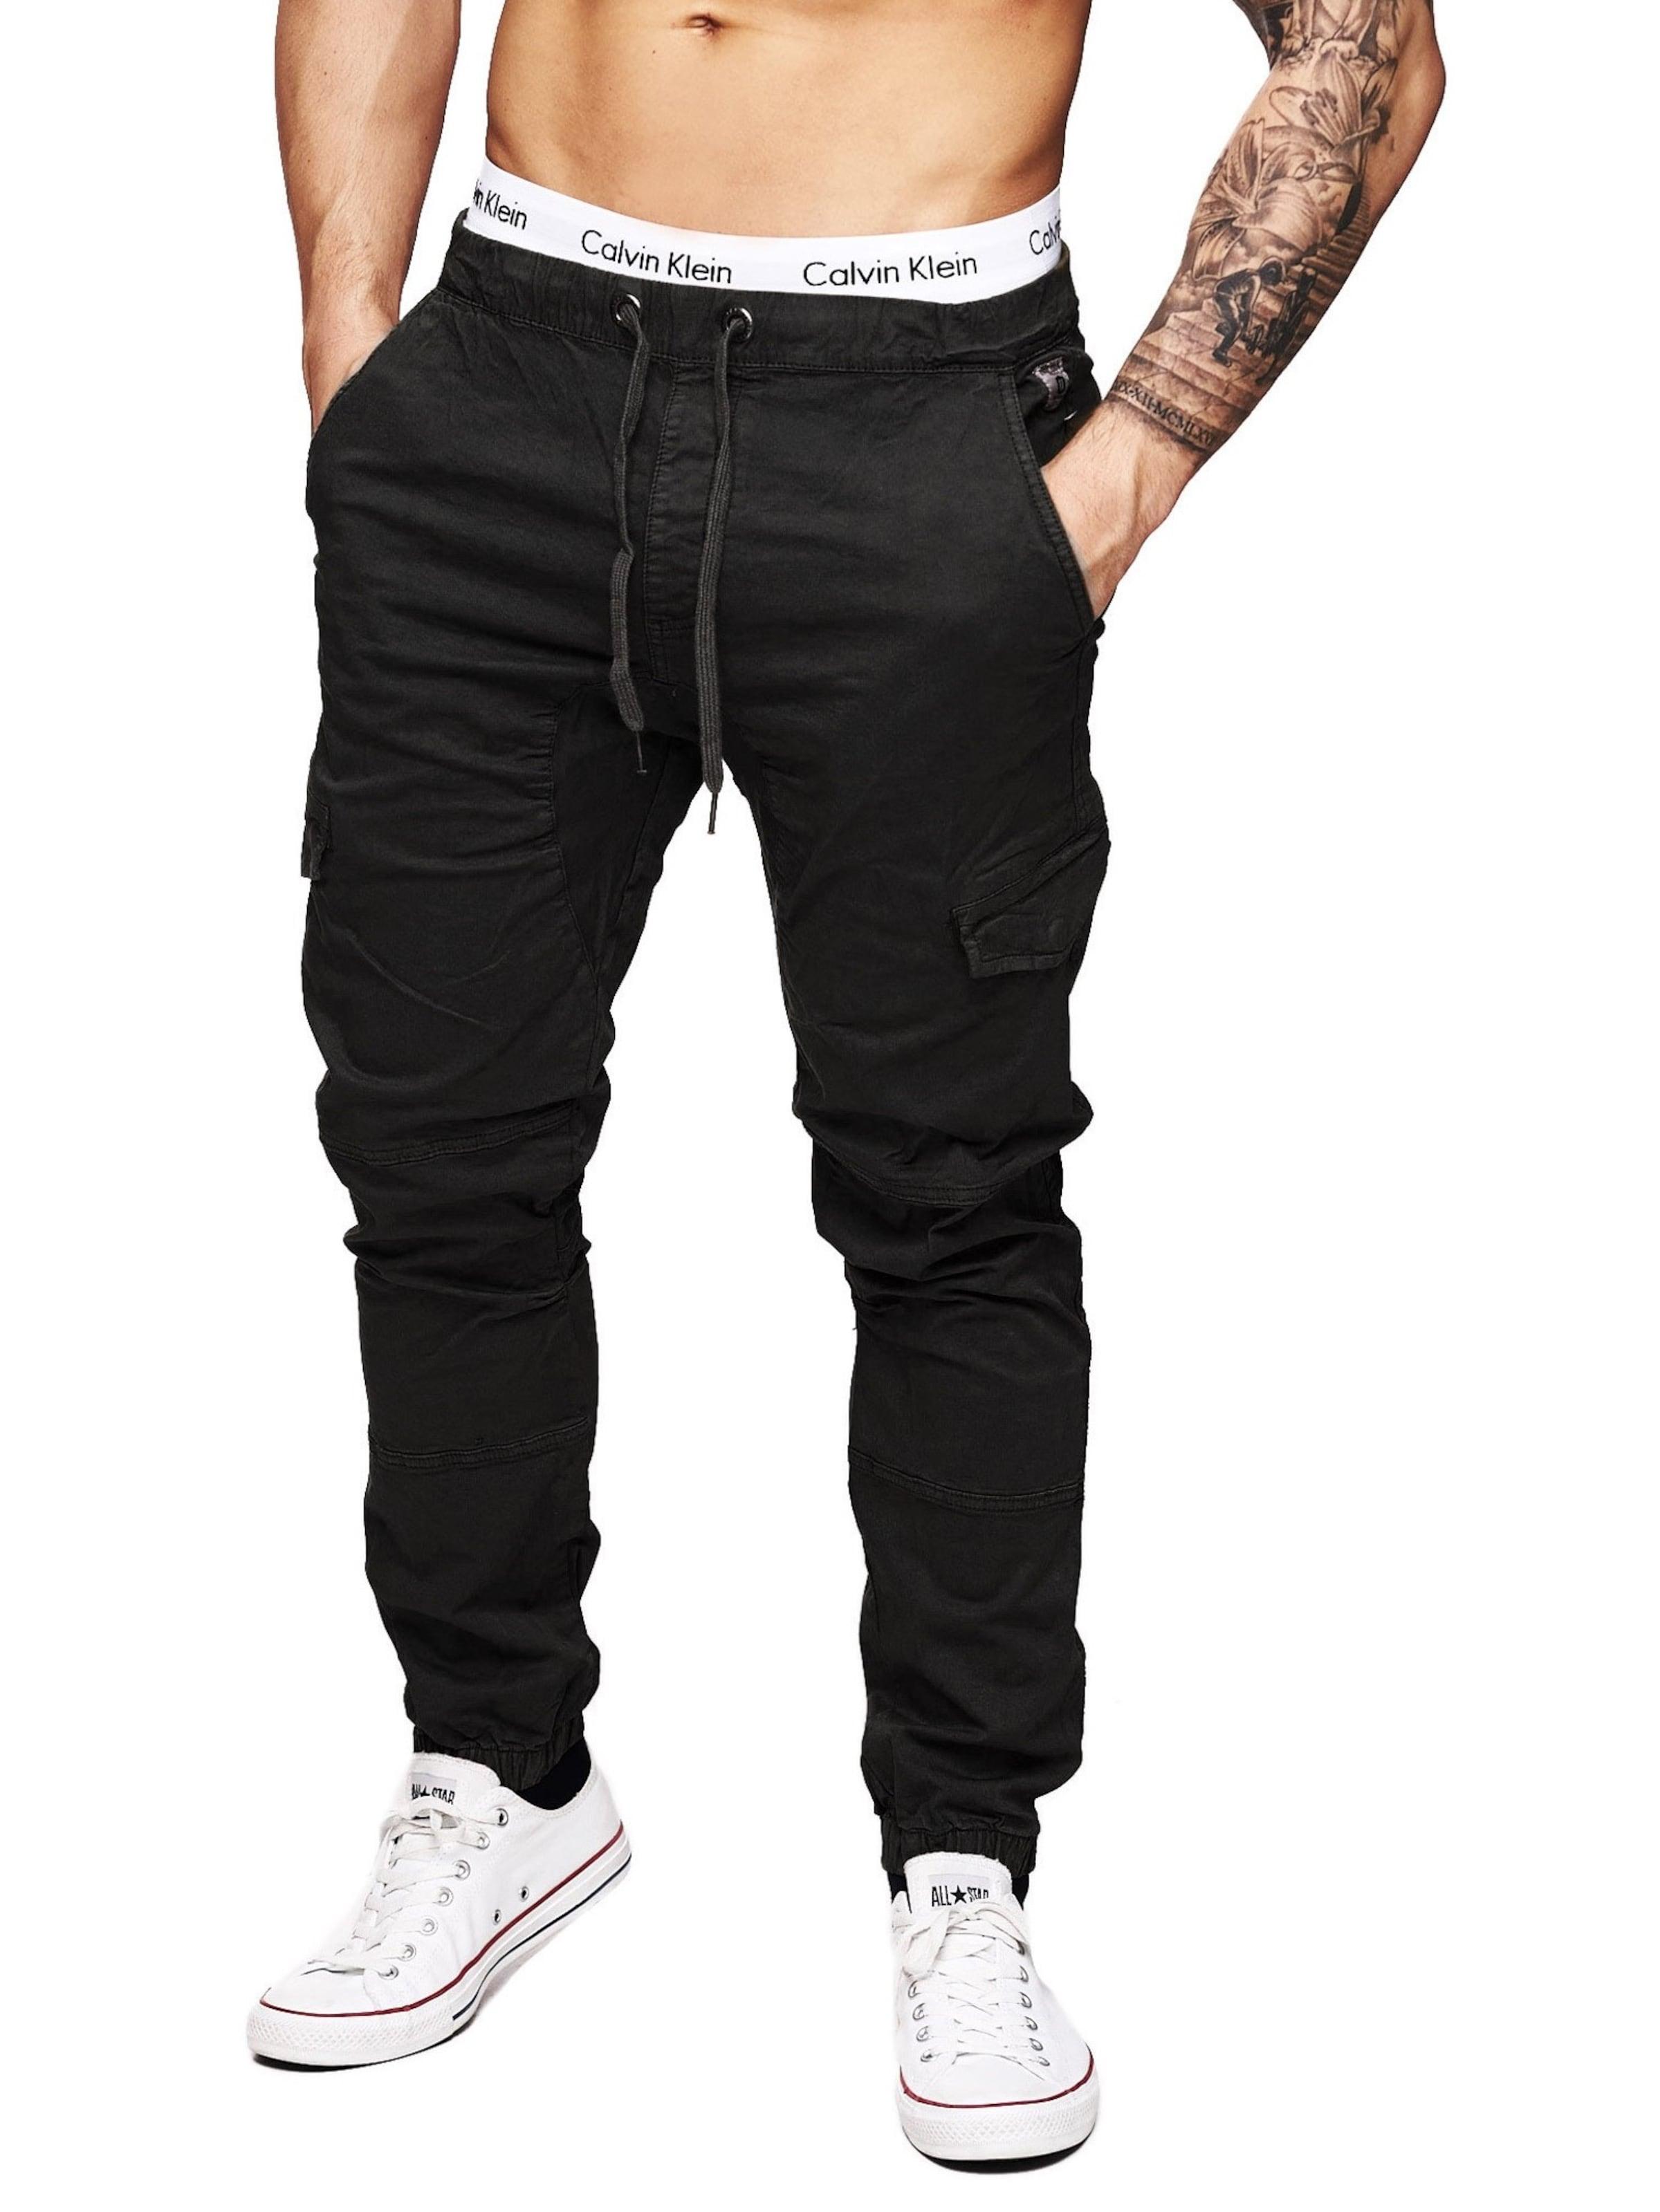 Schwarz Cargo Indicode Levi In Jeans ' Cargohosen shoCBQrdtx